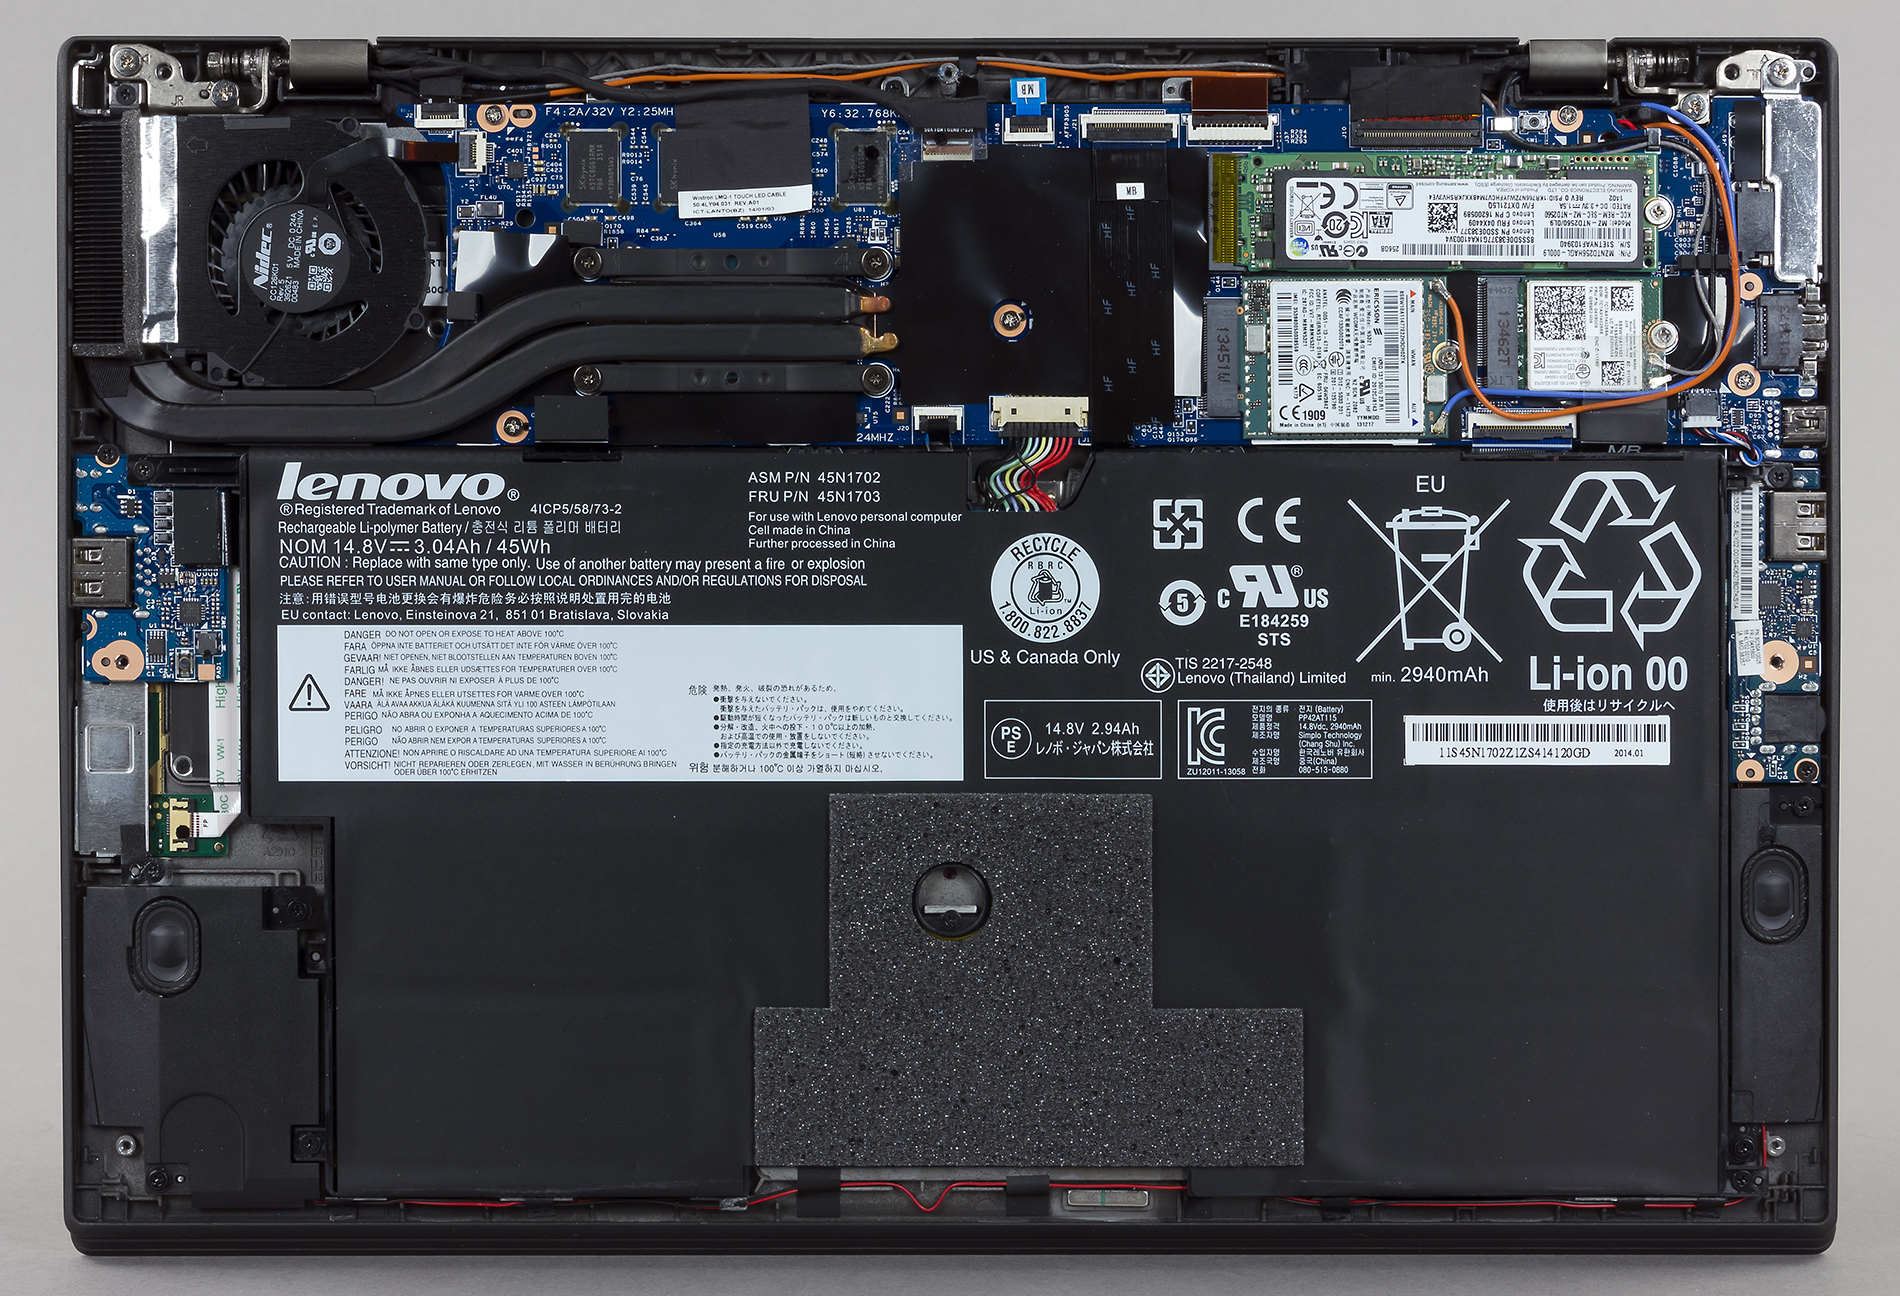 Lenovo g555 инструкция по разборке